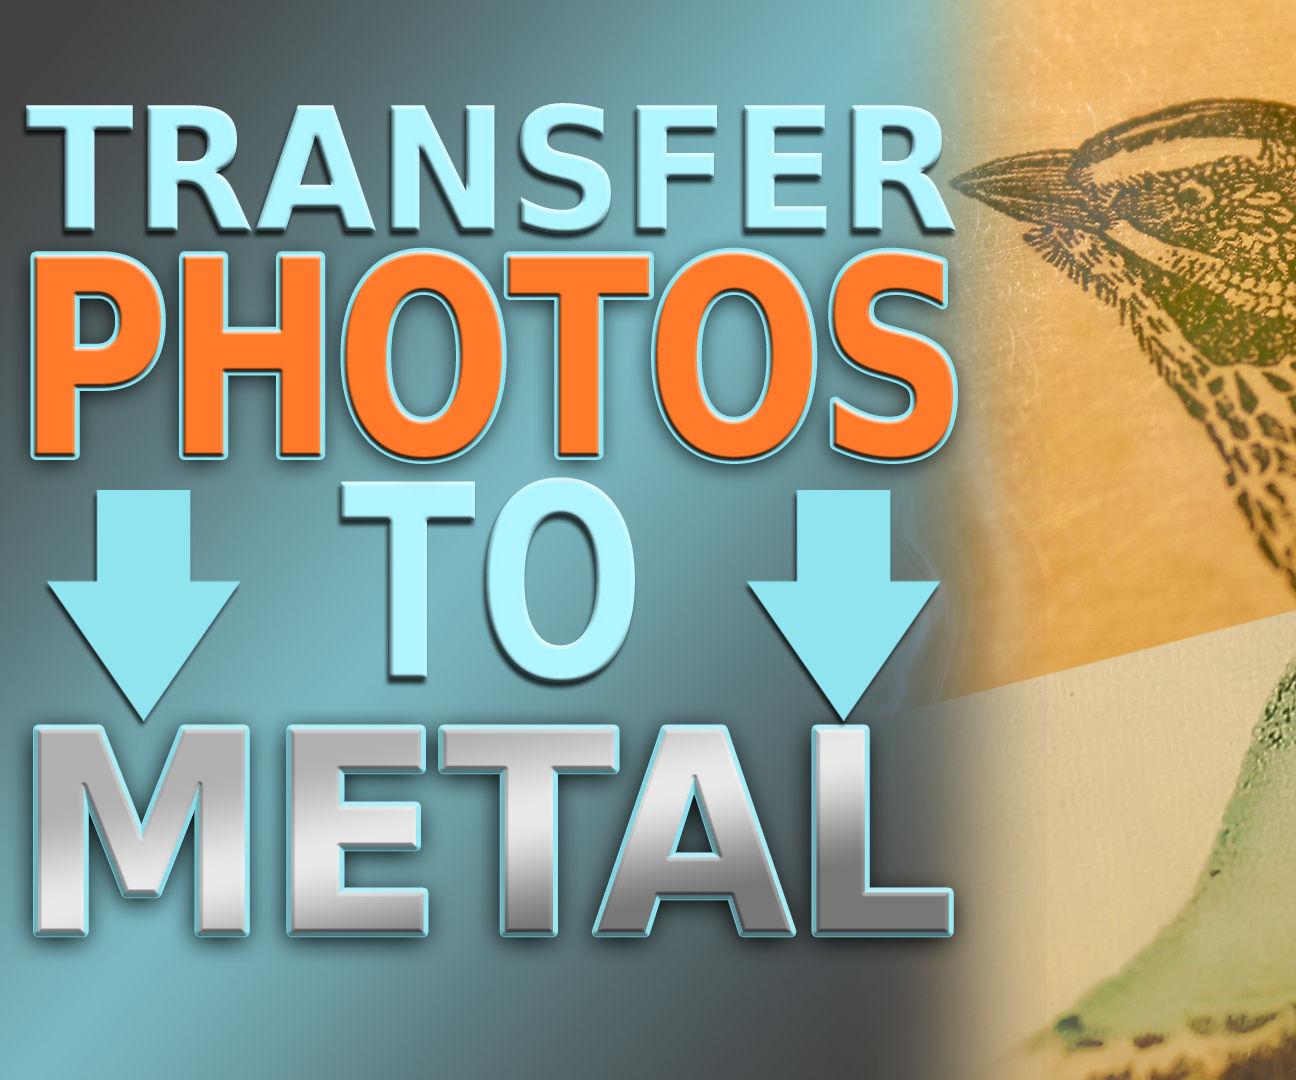 Transfer PHOTOS to METAL